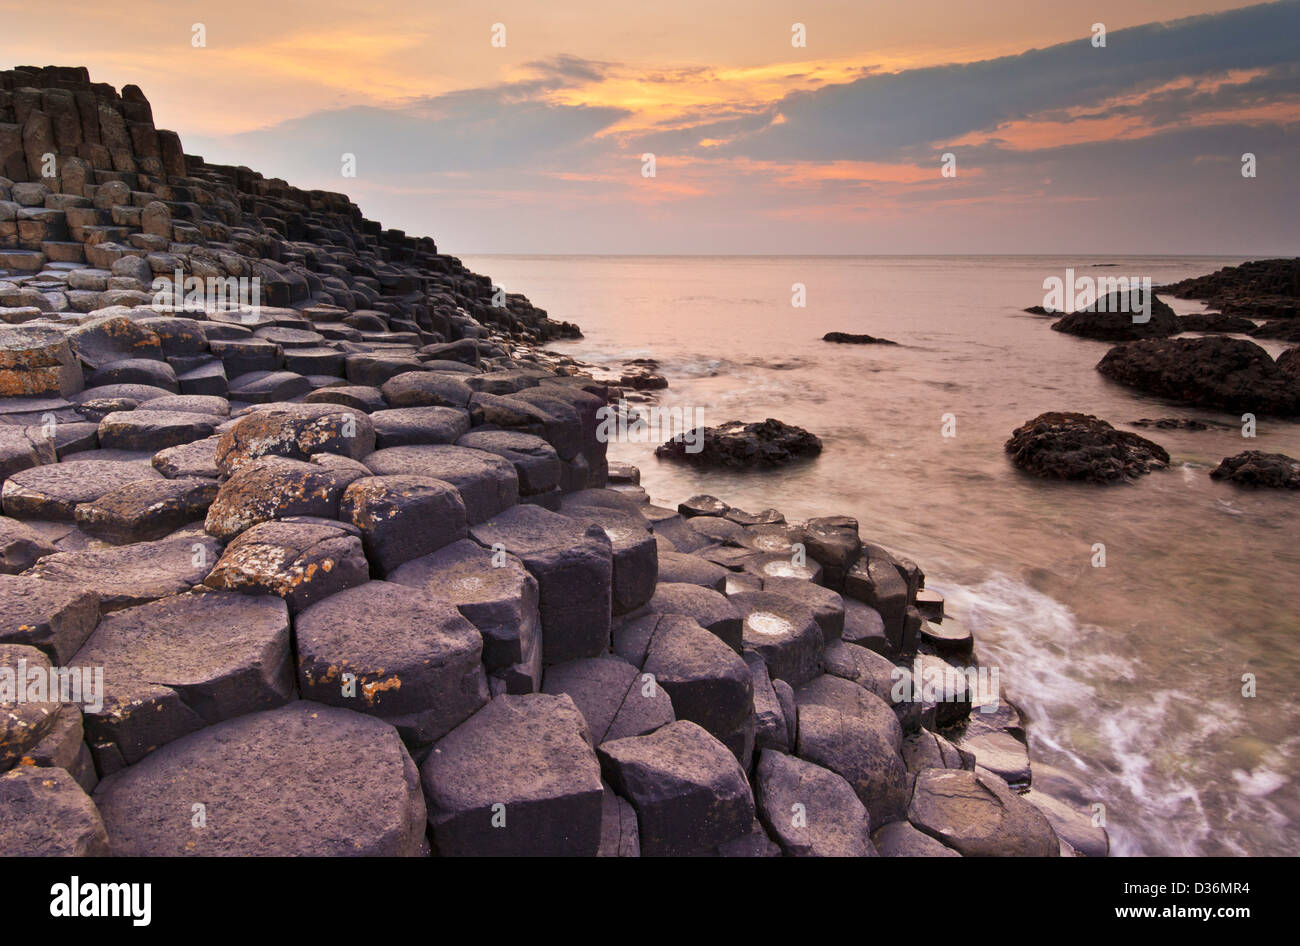 Giants Causeway north Antrim coast County Antrim Northern Ireland GB UK EU Europe - Stock Image